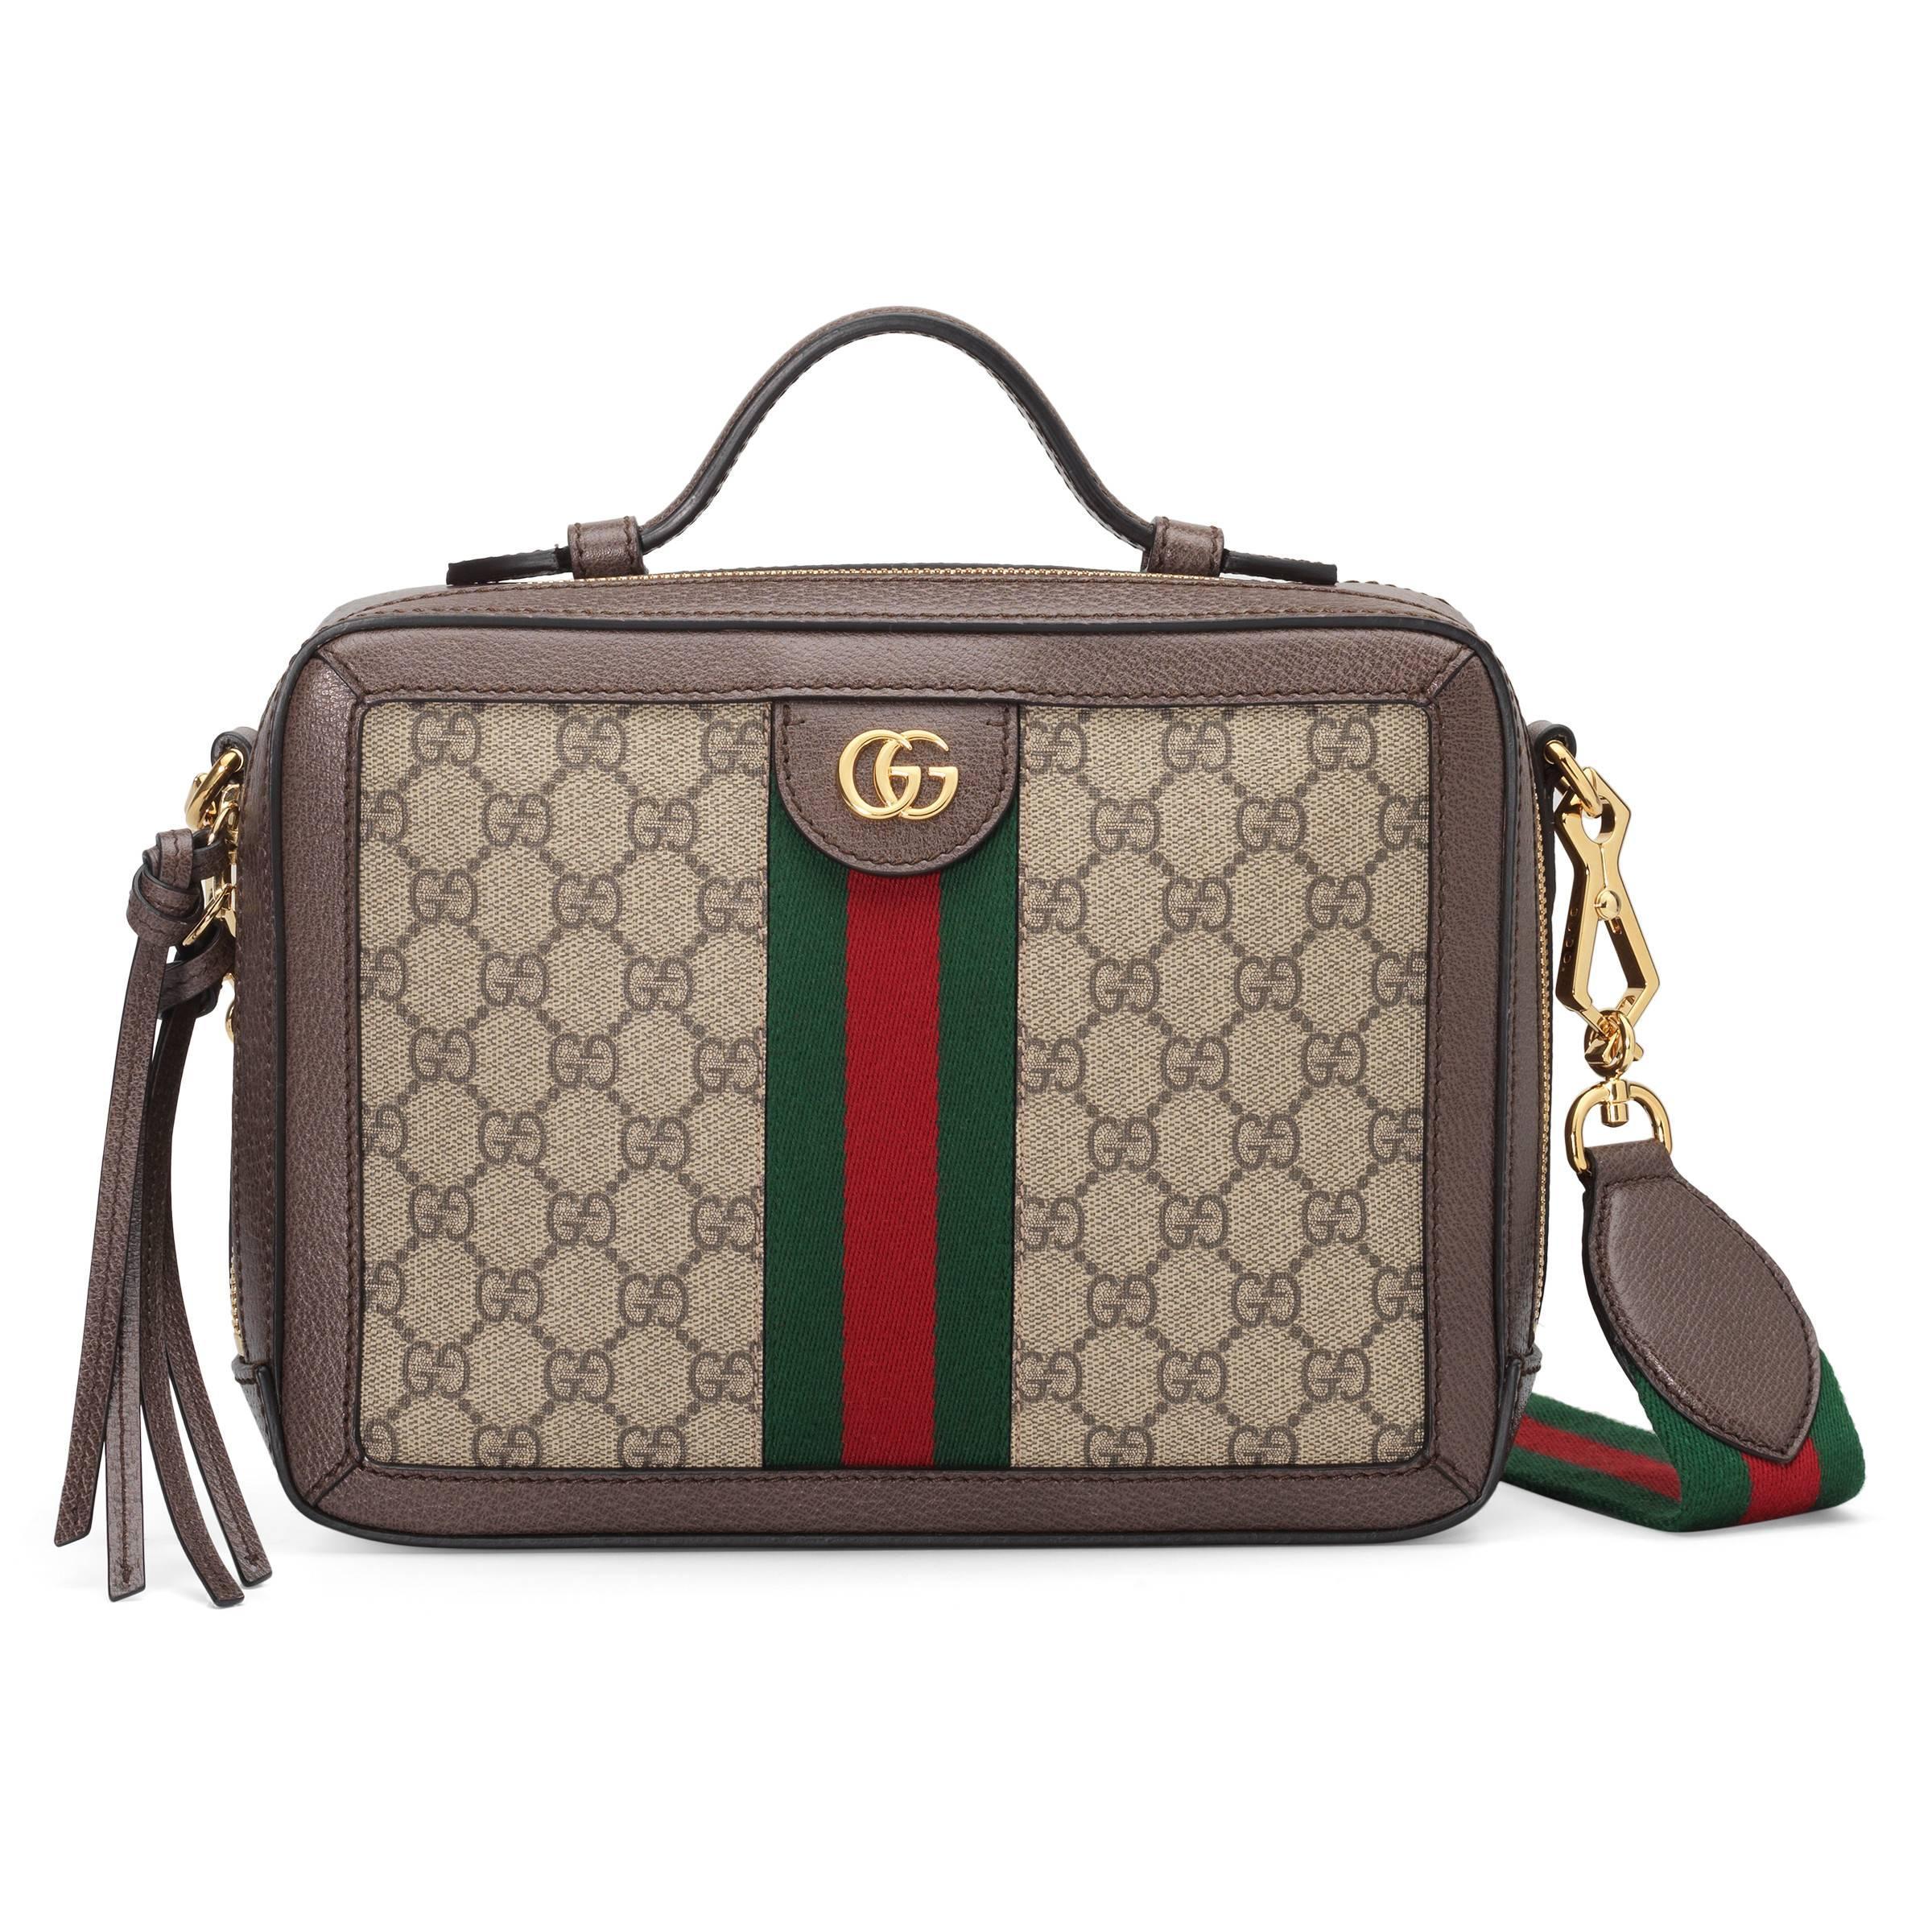 87bb9b80c3 Gucci - Multicolor Bolso de Hombro Ophidia Pequeño con GG - Lyst. Ver en  pantalla completa